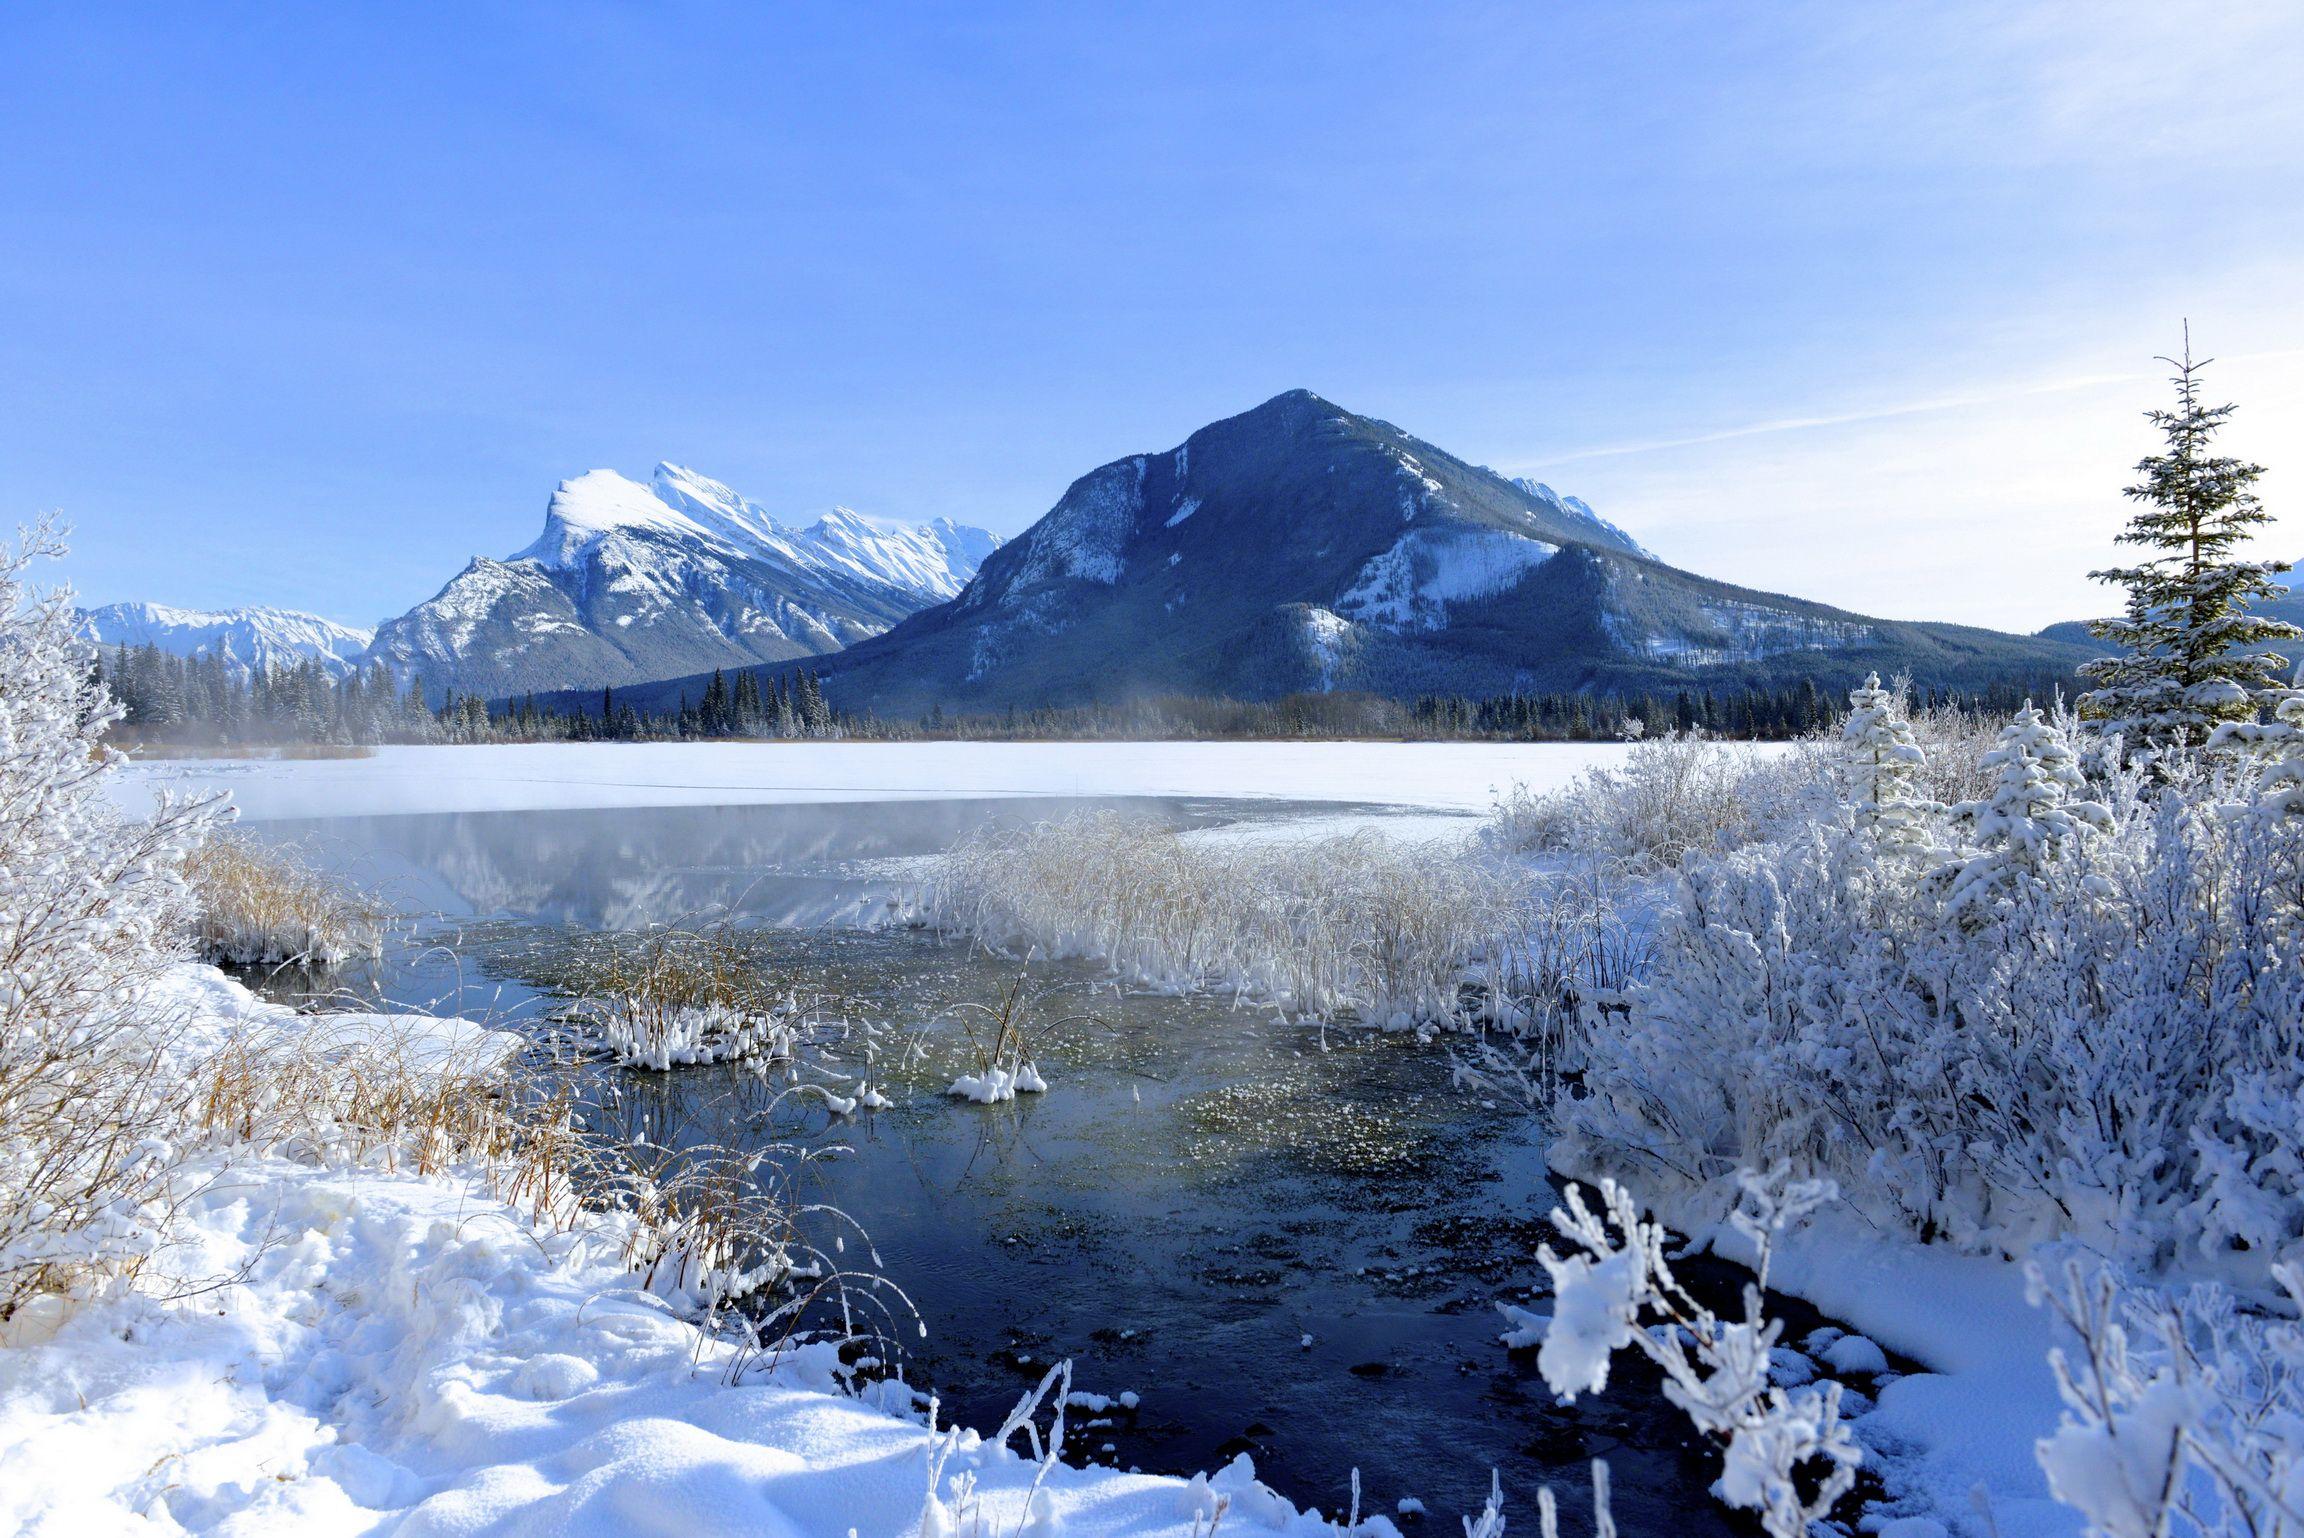 Landscapes winter mountains wallpaper   2304x1538   37850   WallpaperUP